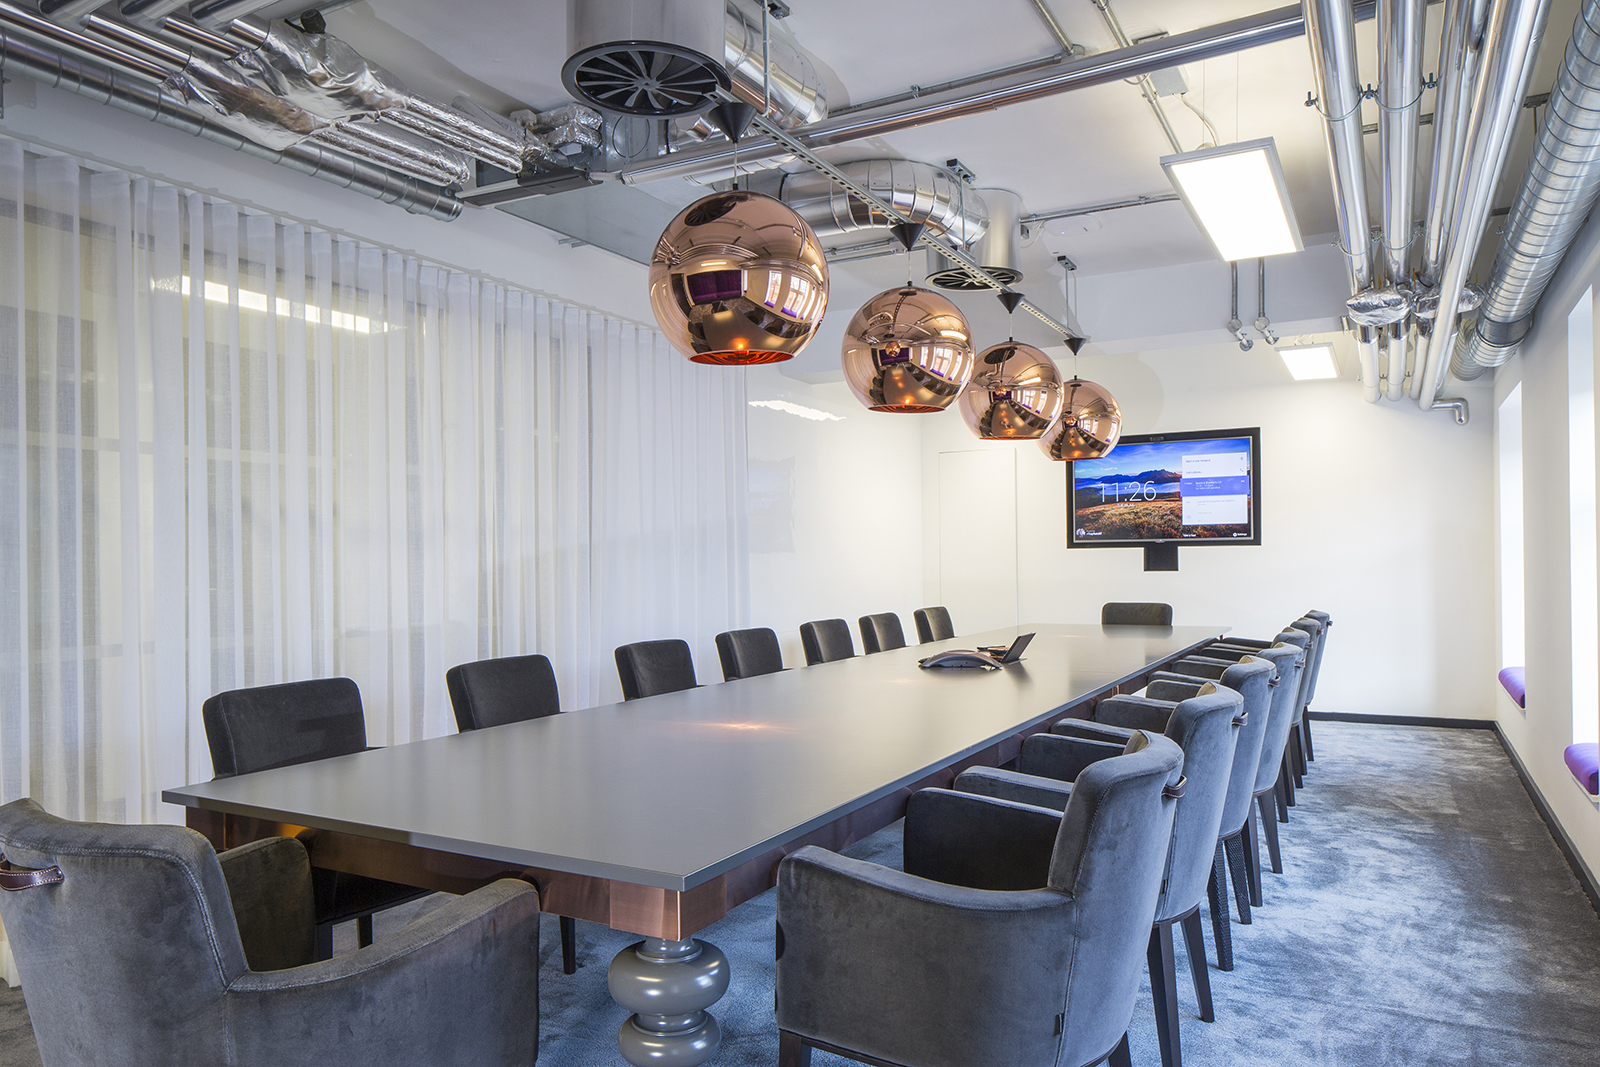 spotify-london-office-5